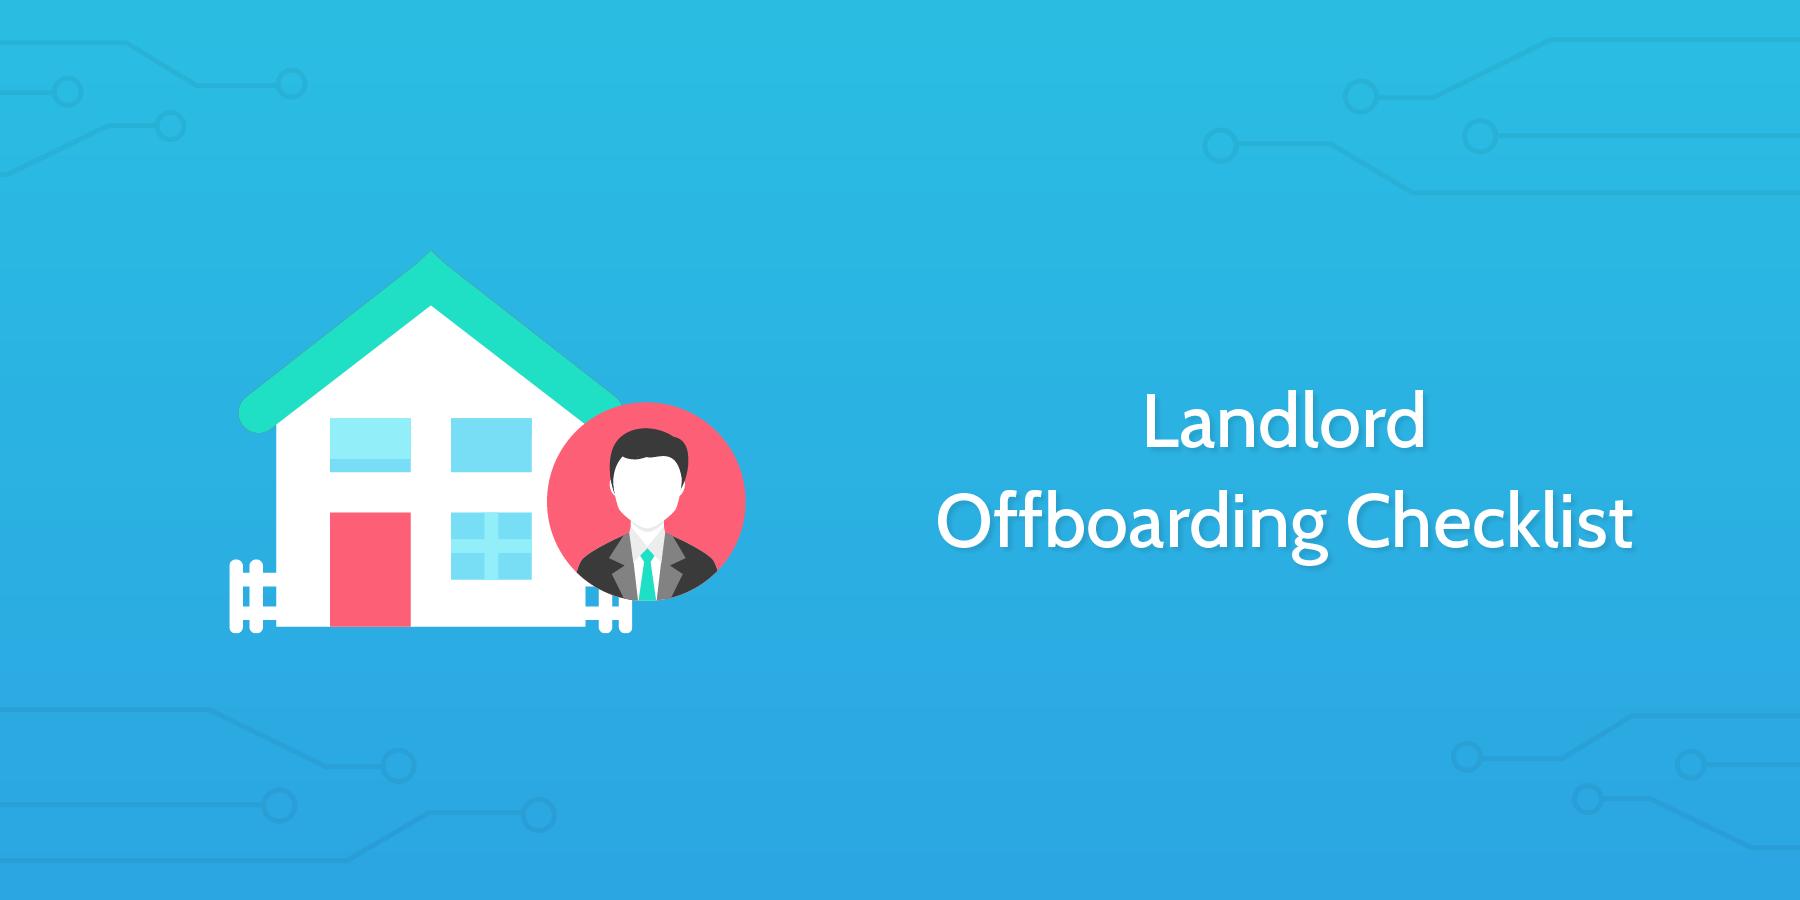 landlord offboarding checklist